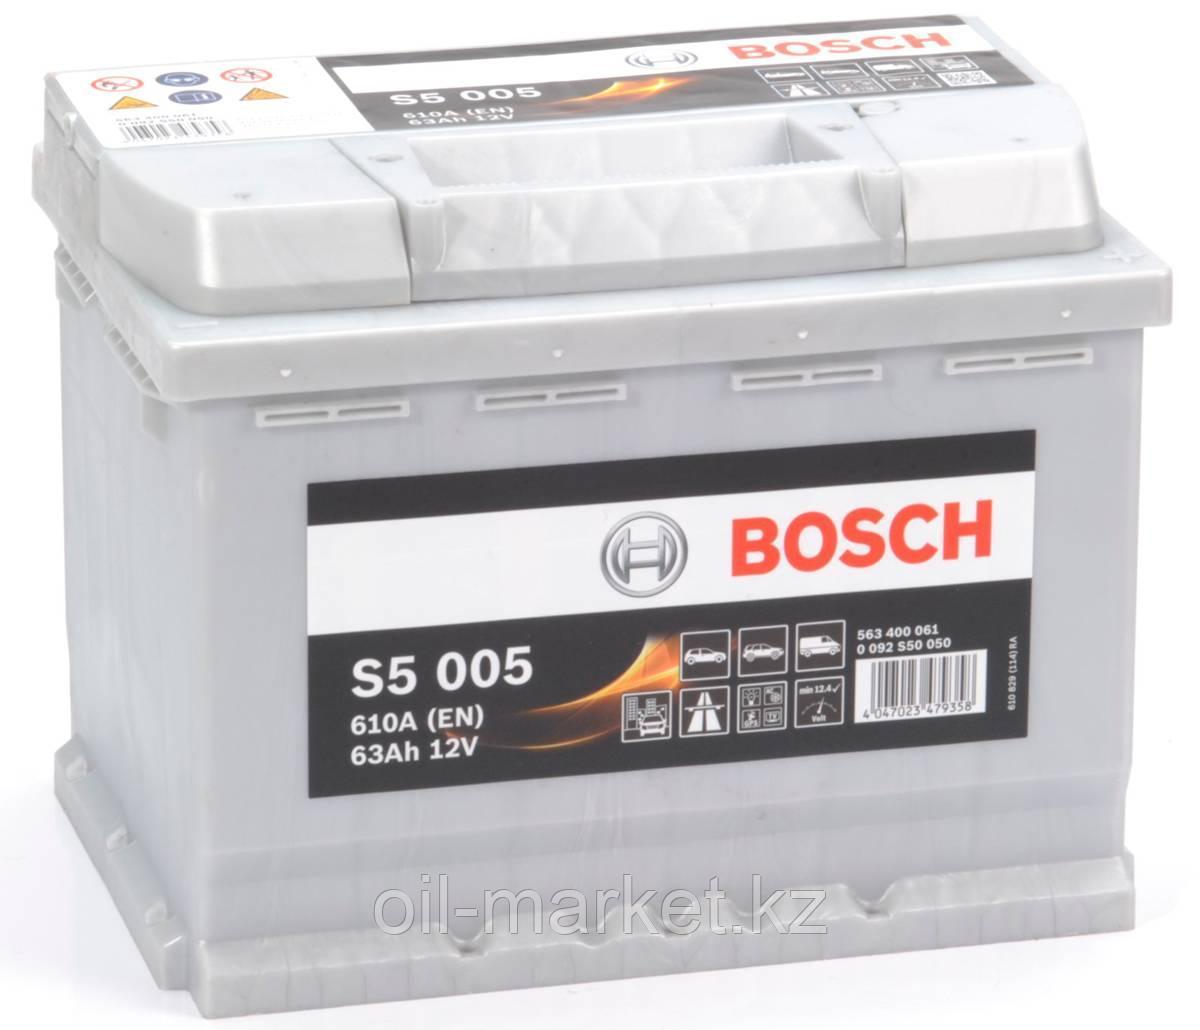 Аккумулятор Bosch EURO 63 Ah